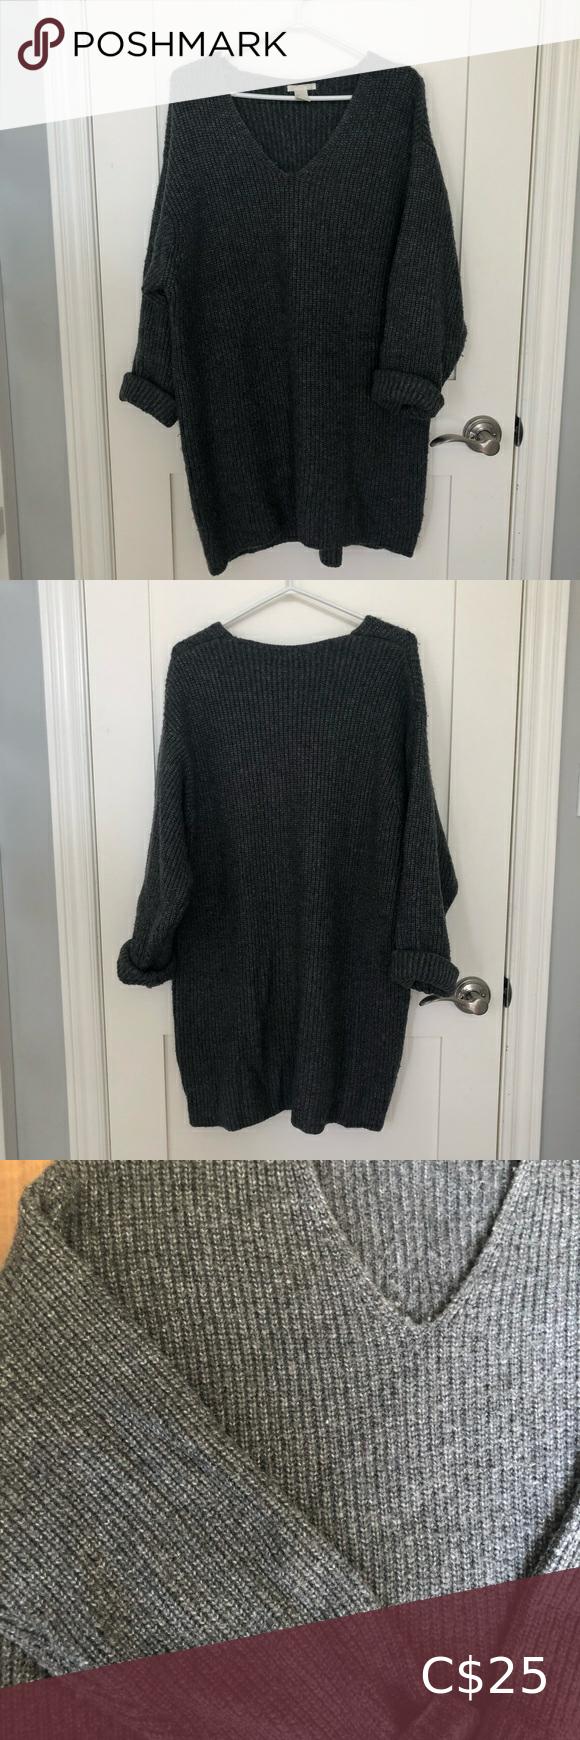 H&m oversized knit sweater